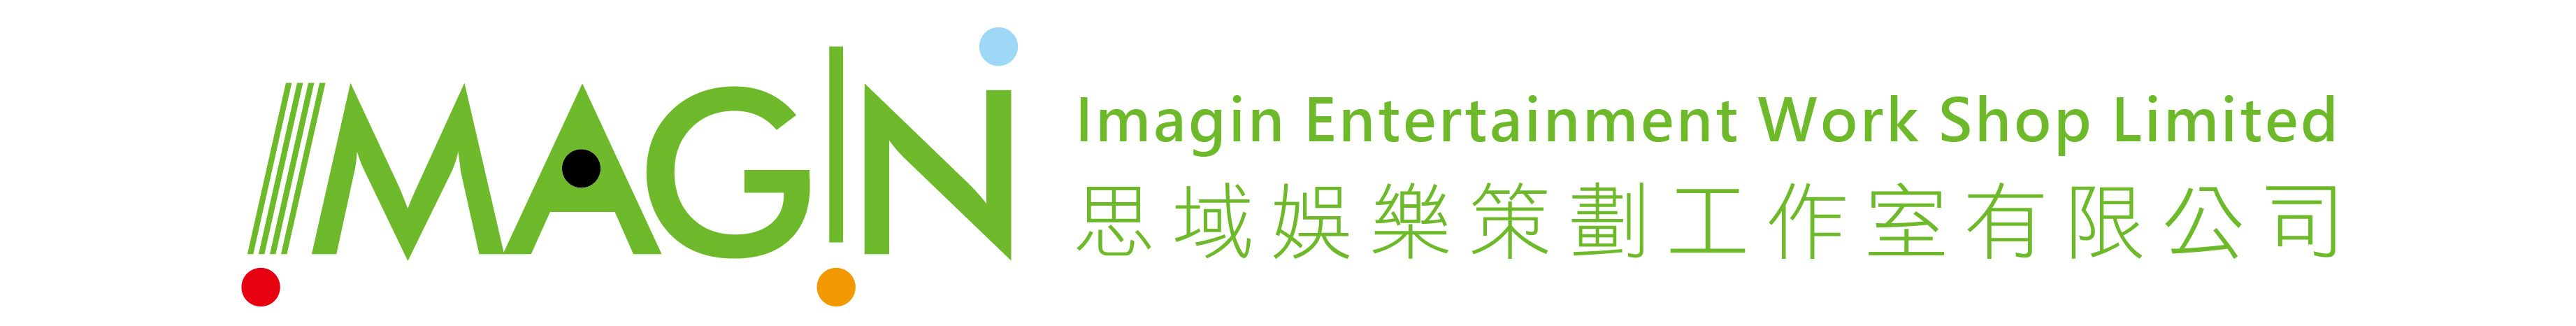 Imagin Entertainment Work Shop Limited 思域娛樂策劃工作室有限公司